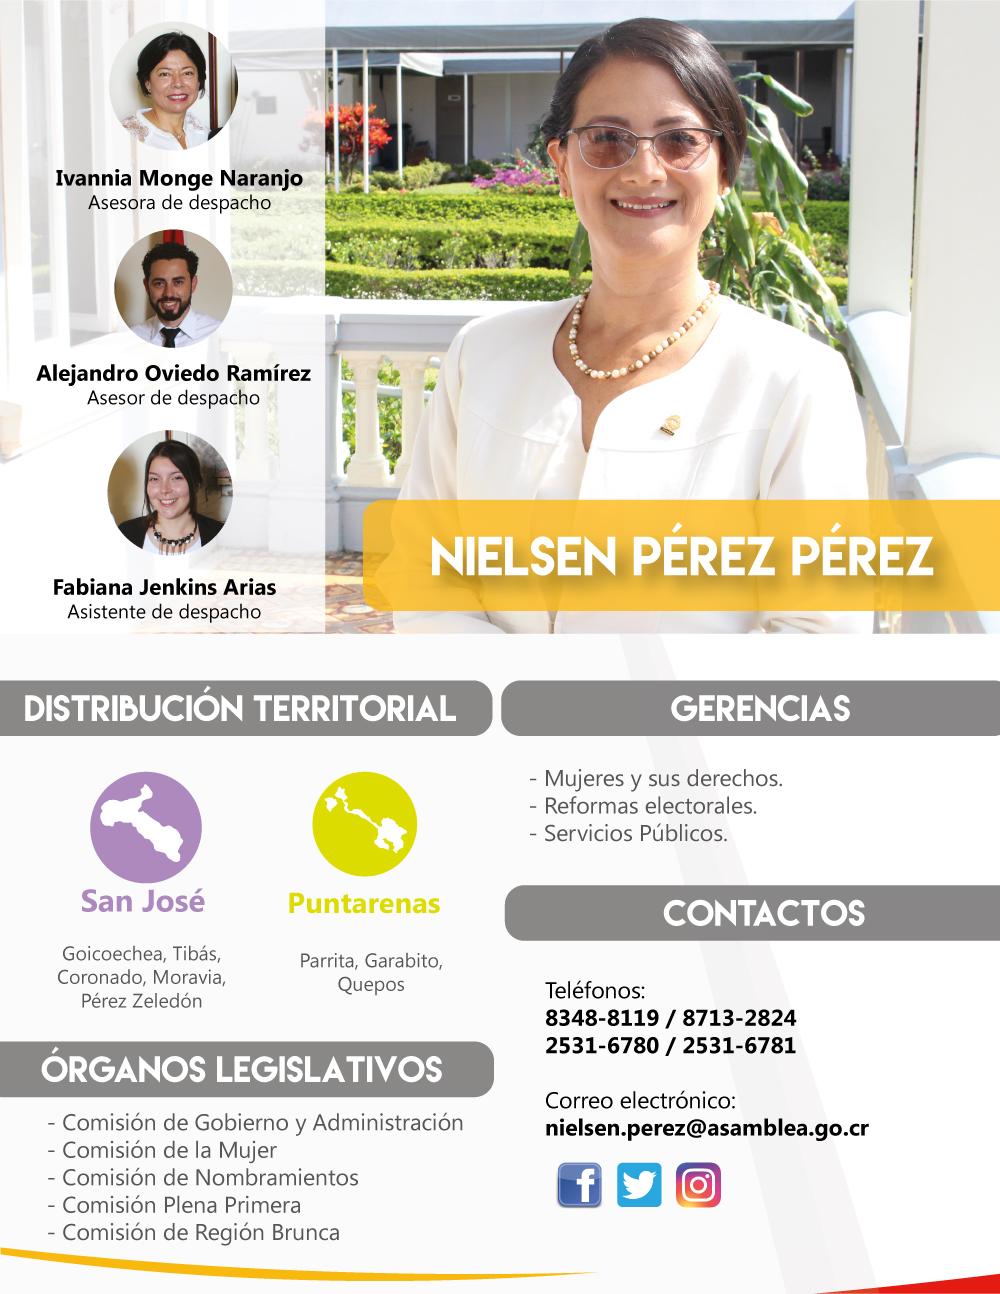 Despacho-Nielsen-P+®rez